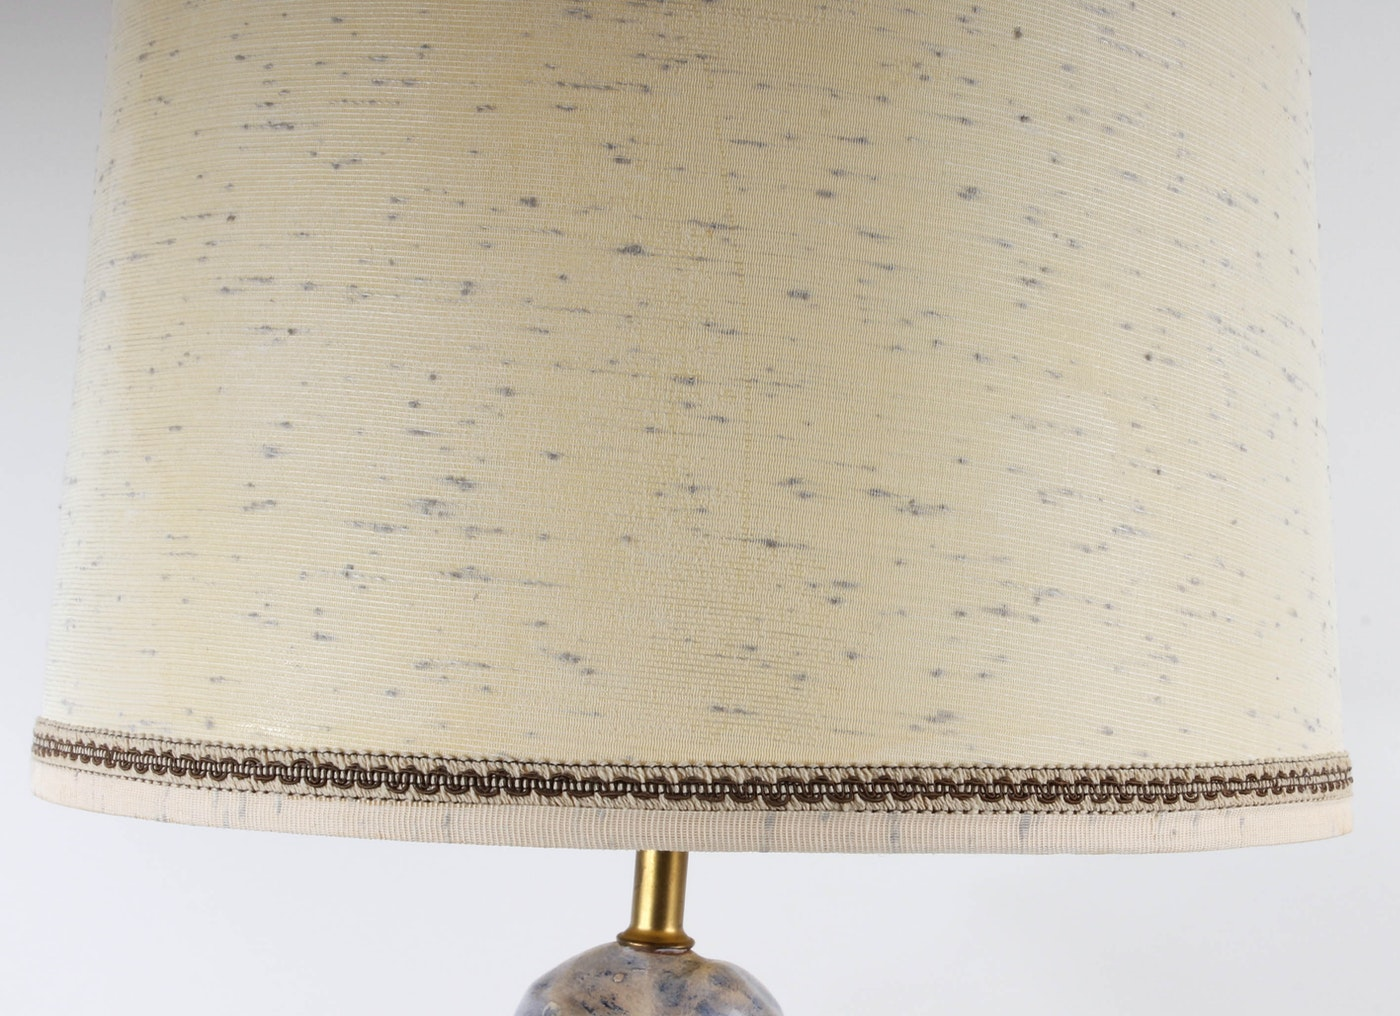 Hand Painted Ceramic Figurine Table Lamp Ebth